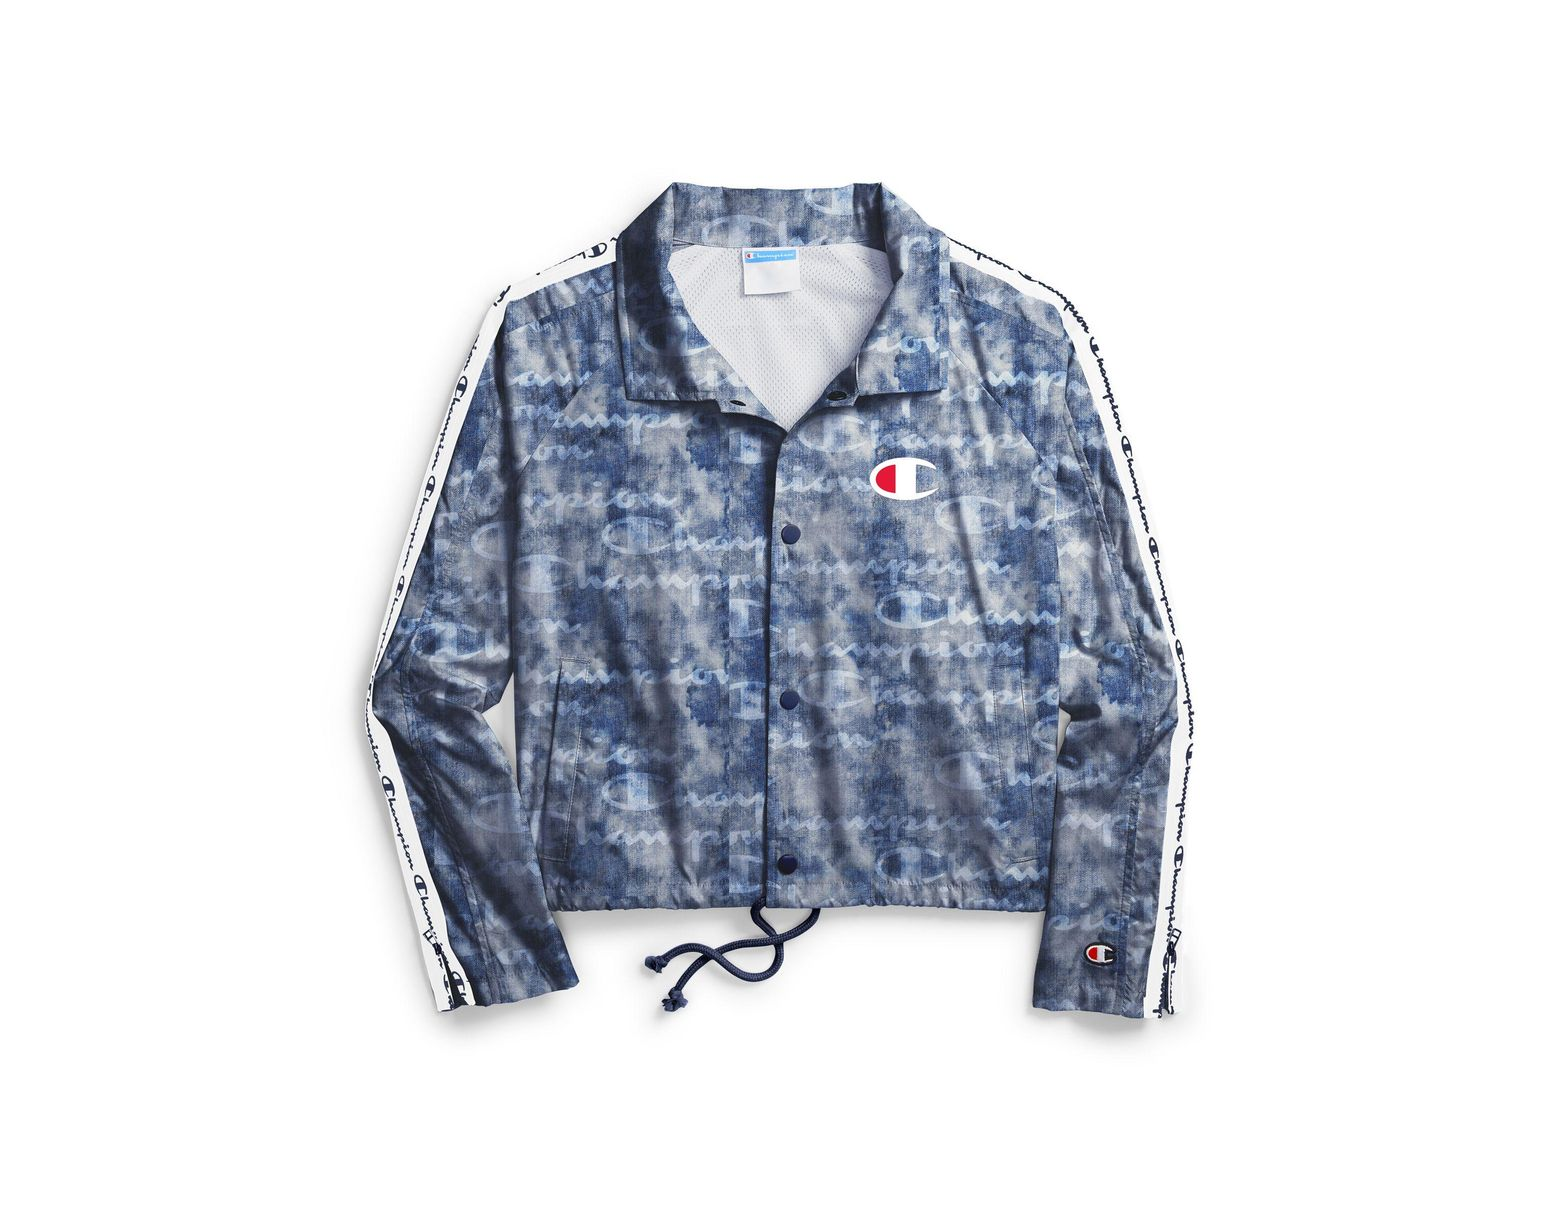 4f0dc5082 Women's Blue Zipper Tape Cropped Coaches Jacket